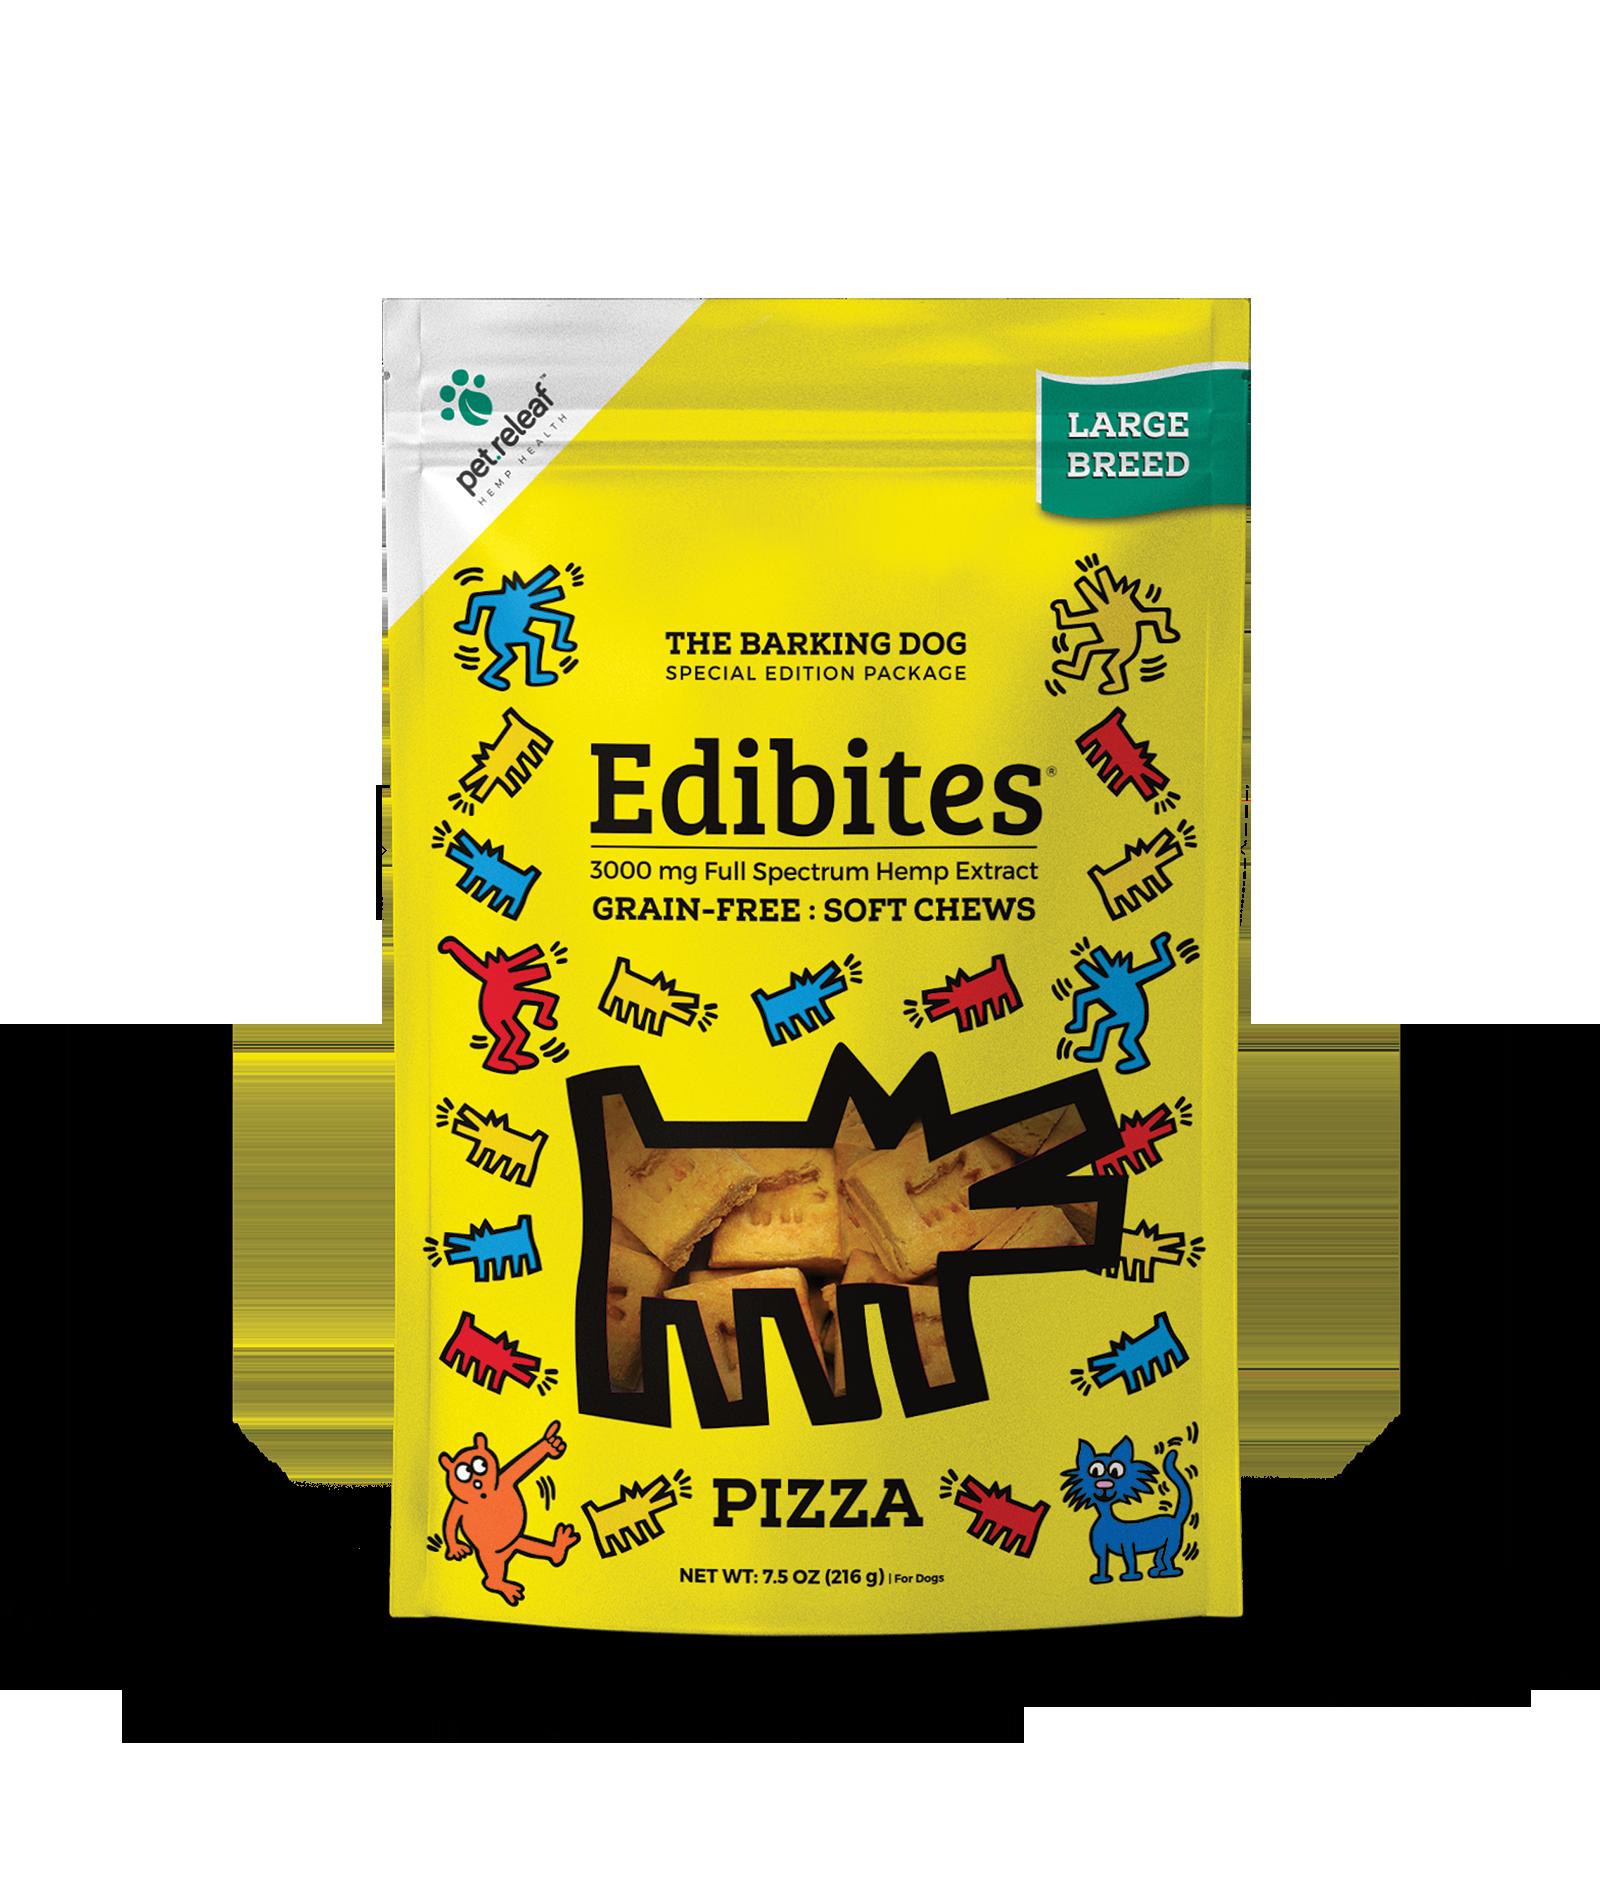 Pet Releaf Edibites Soft Chews Pizza Large Breed Dog Supplement, 3000mg, 7.5-oz